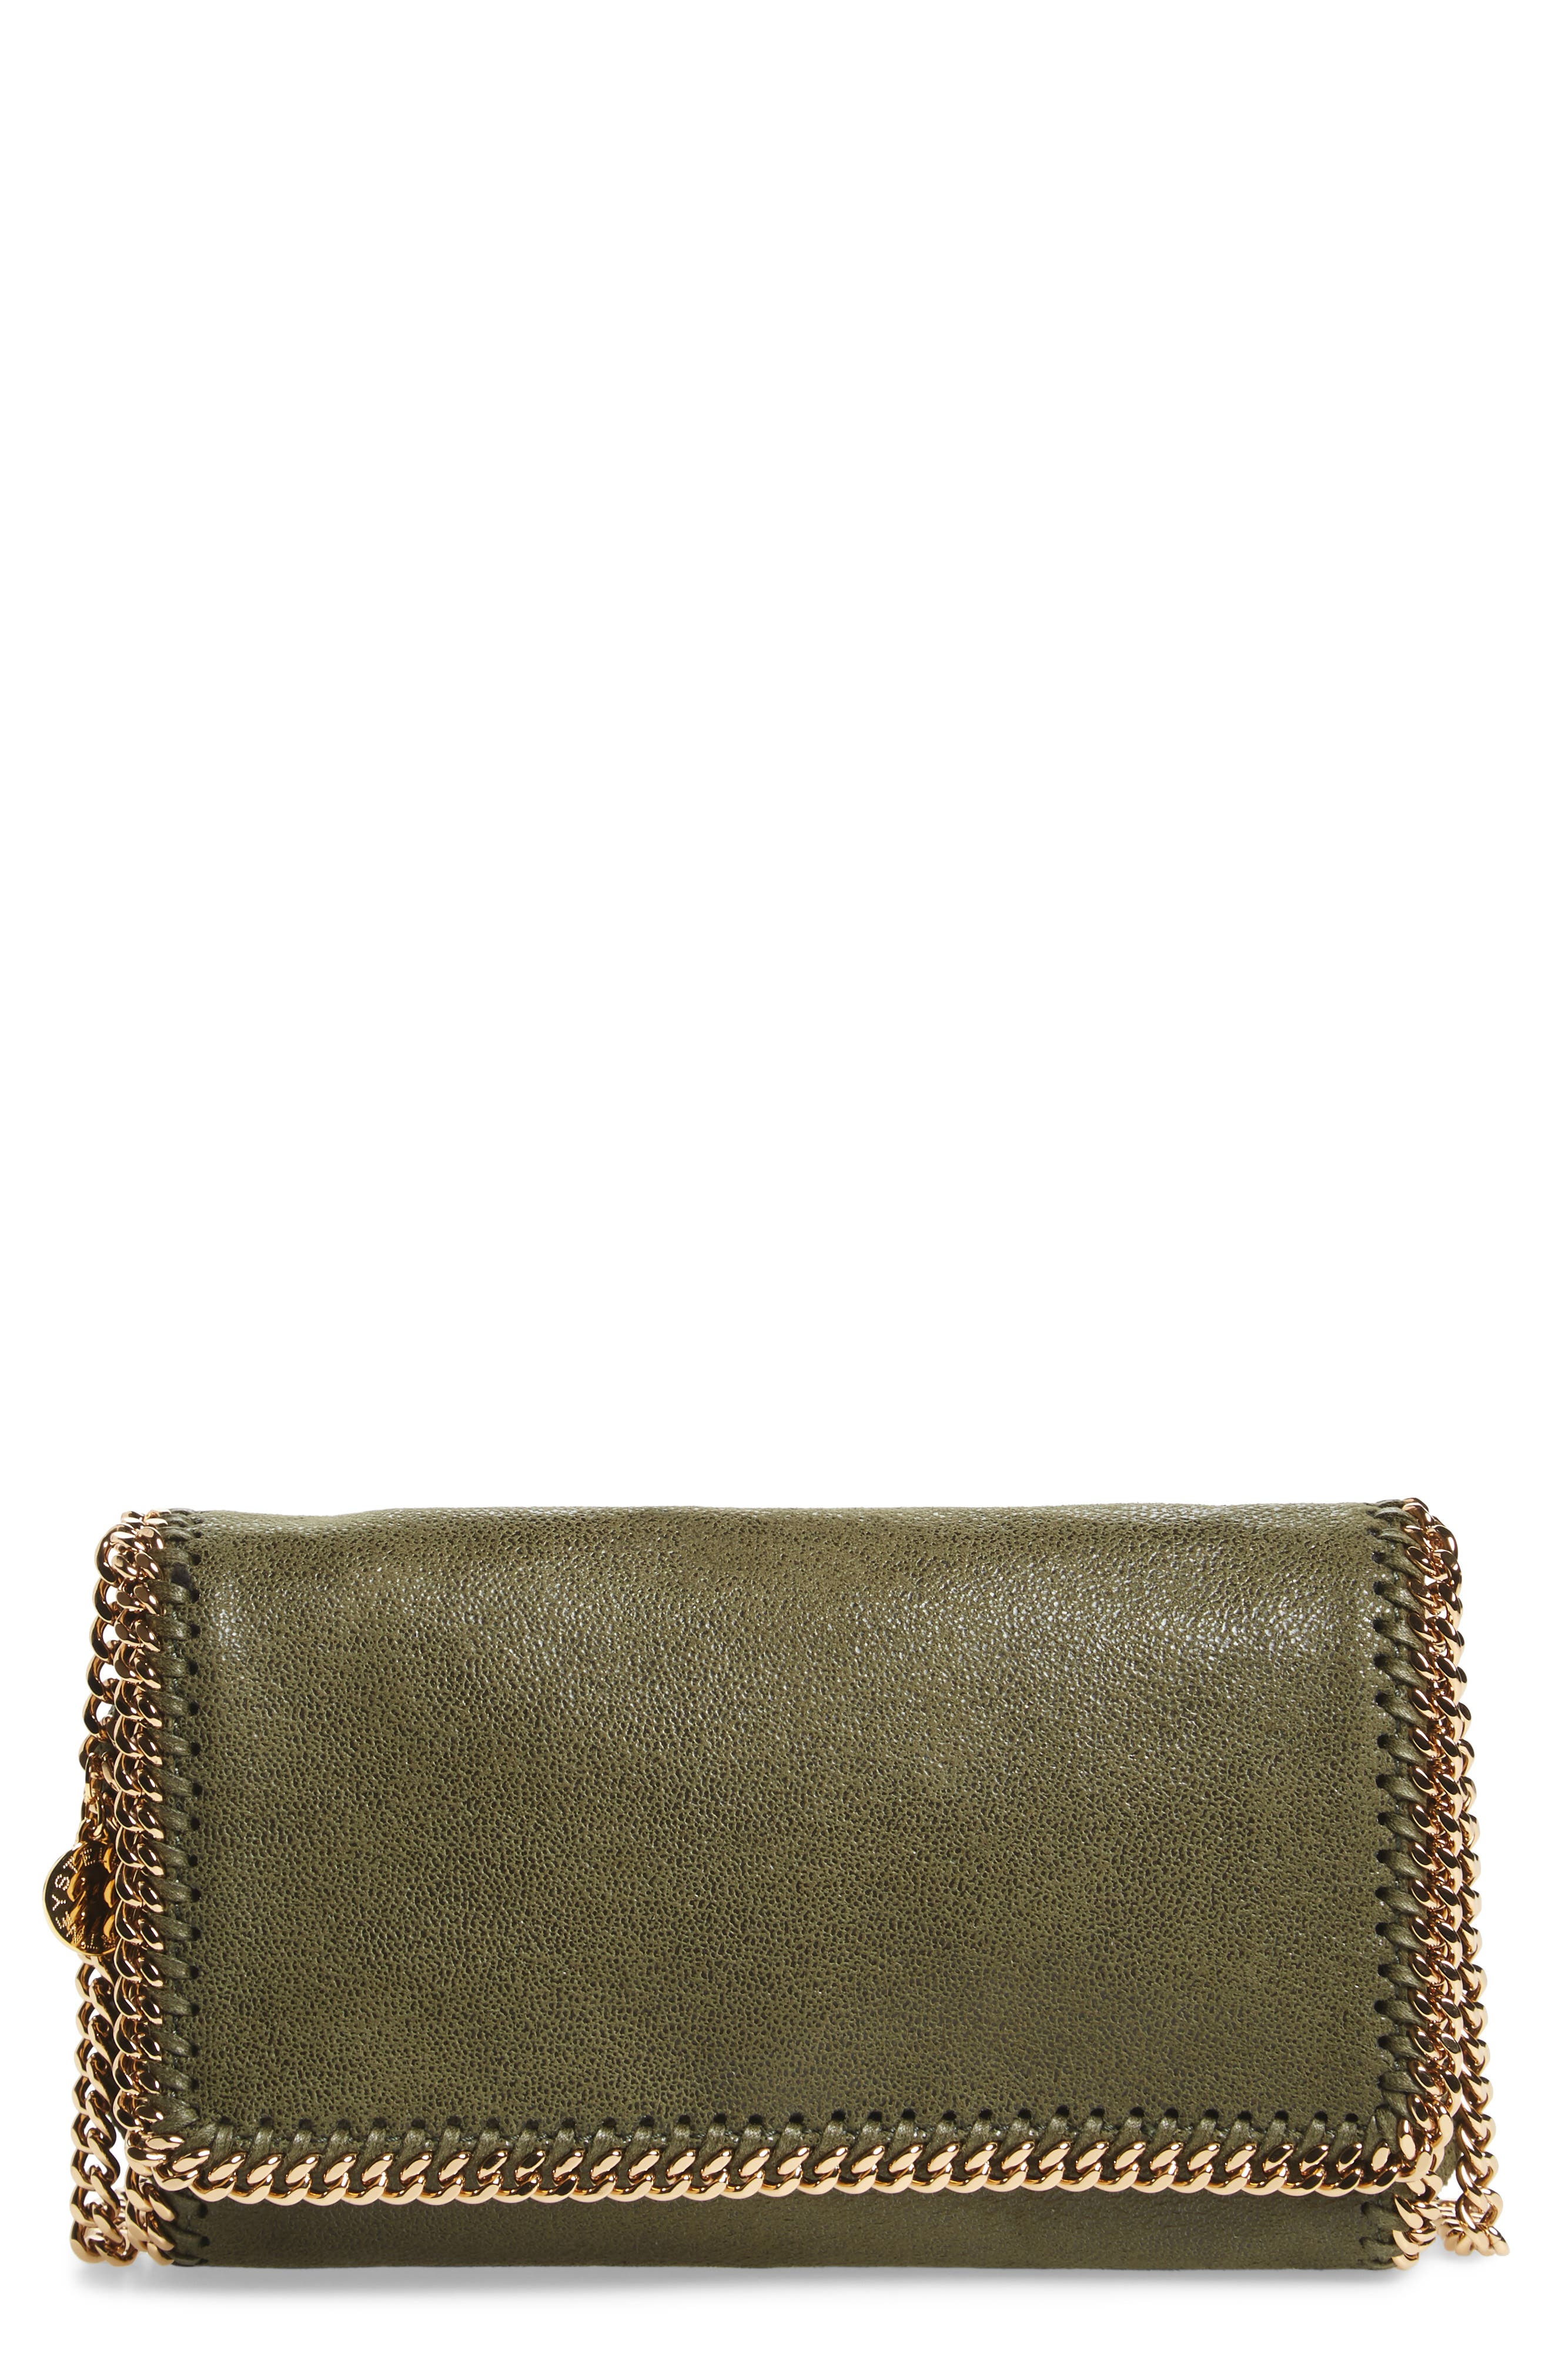 Main Image - Stella McCartney 'Falabella - Shaggy Deer' Faux Leather Crossbody Bag